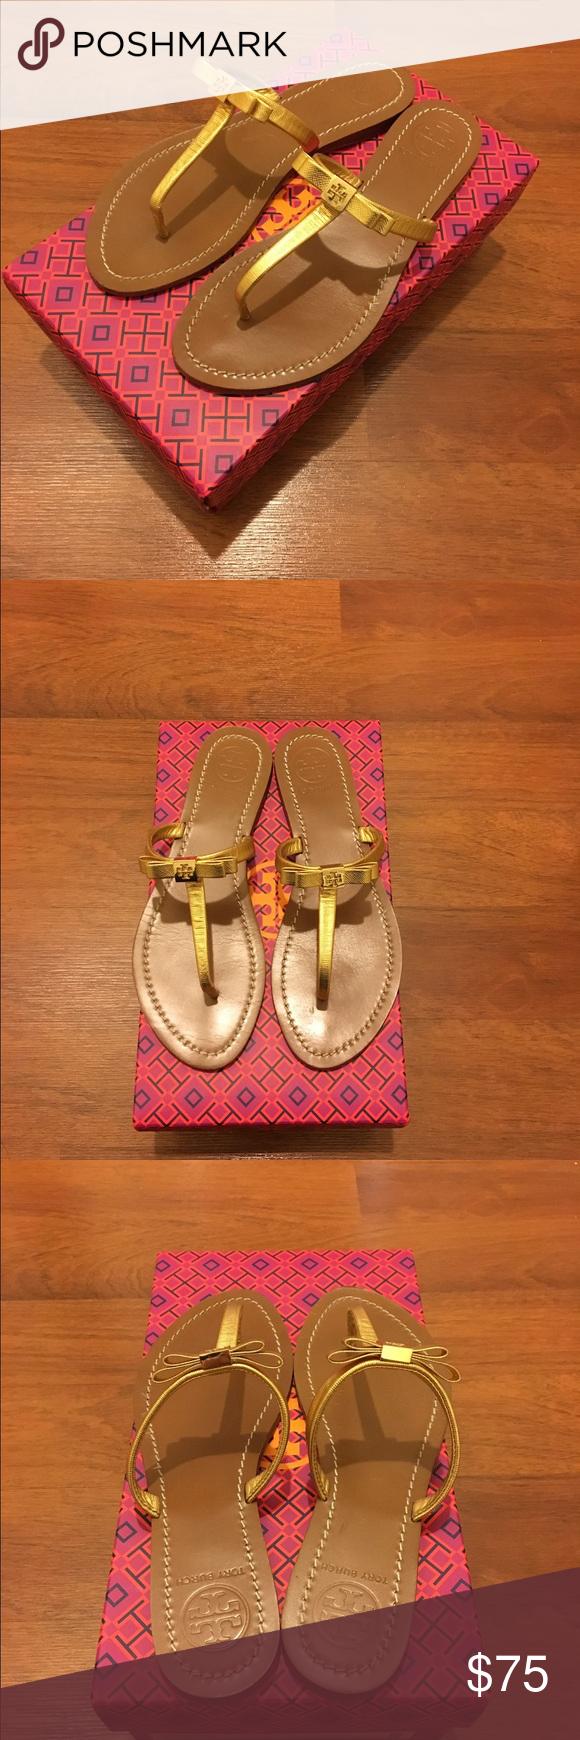 Tory Burch Leighanne flat Tory Burch Leighanne flat - metallic gold - Lightly worn Tory Burch Shoes Sandals